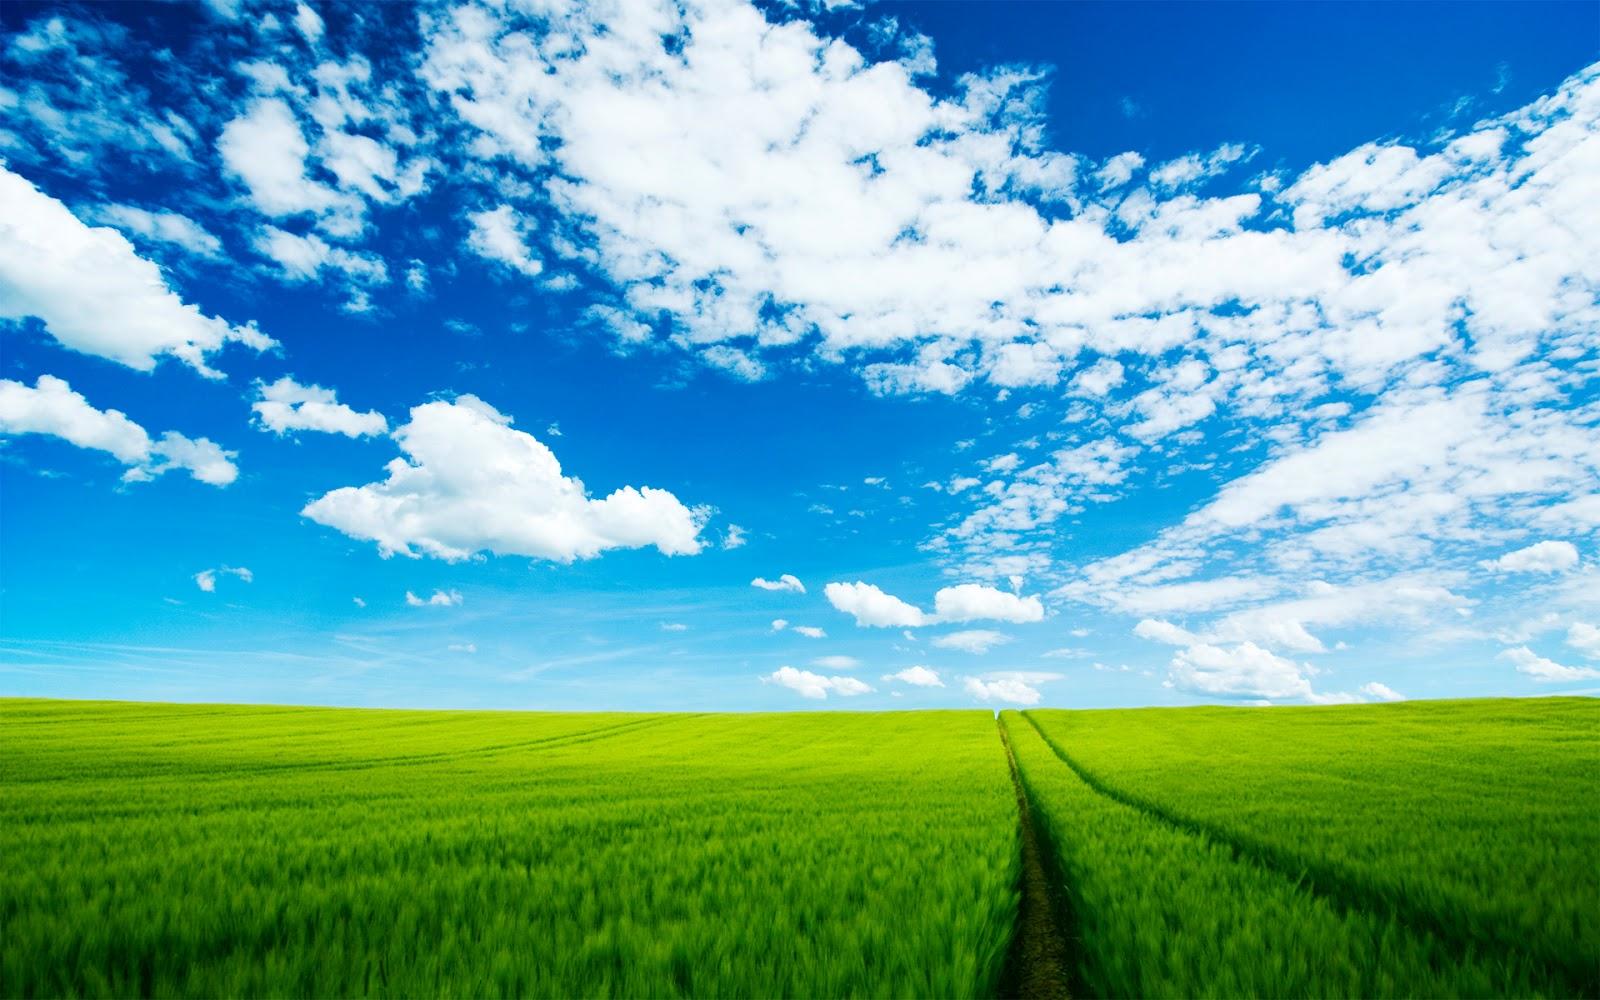 Beautiful Summer Scenery Wallpaper Scenery Backgrounds 1600x1000